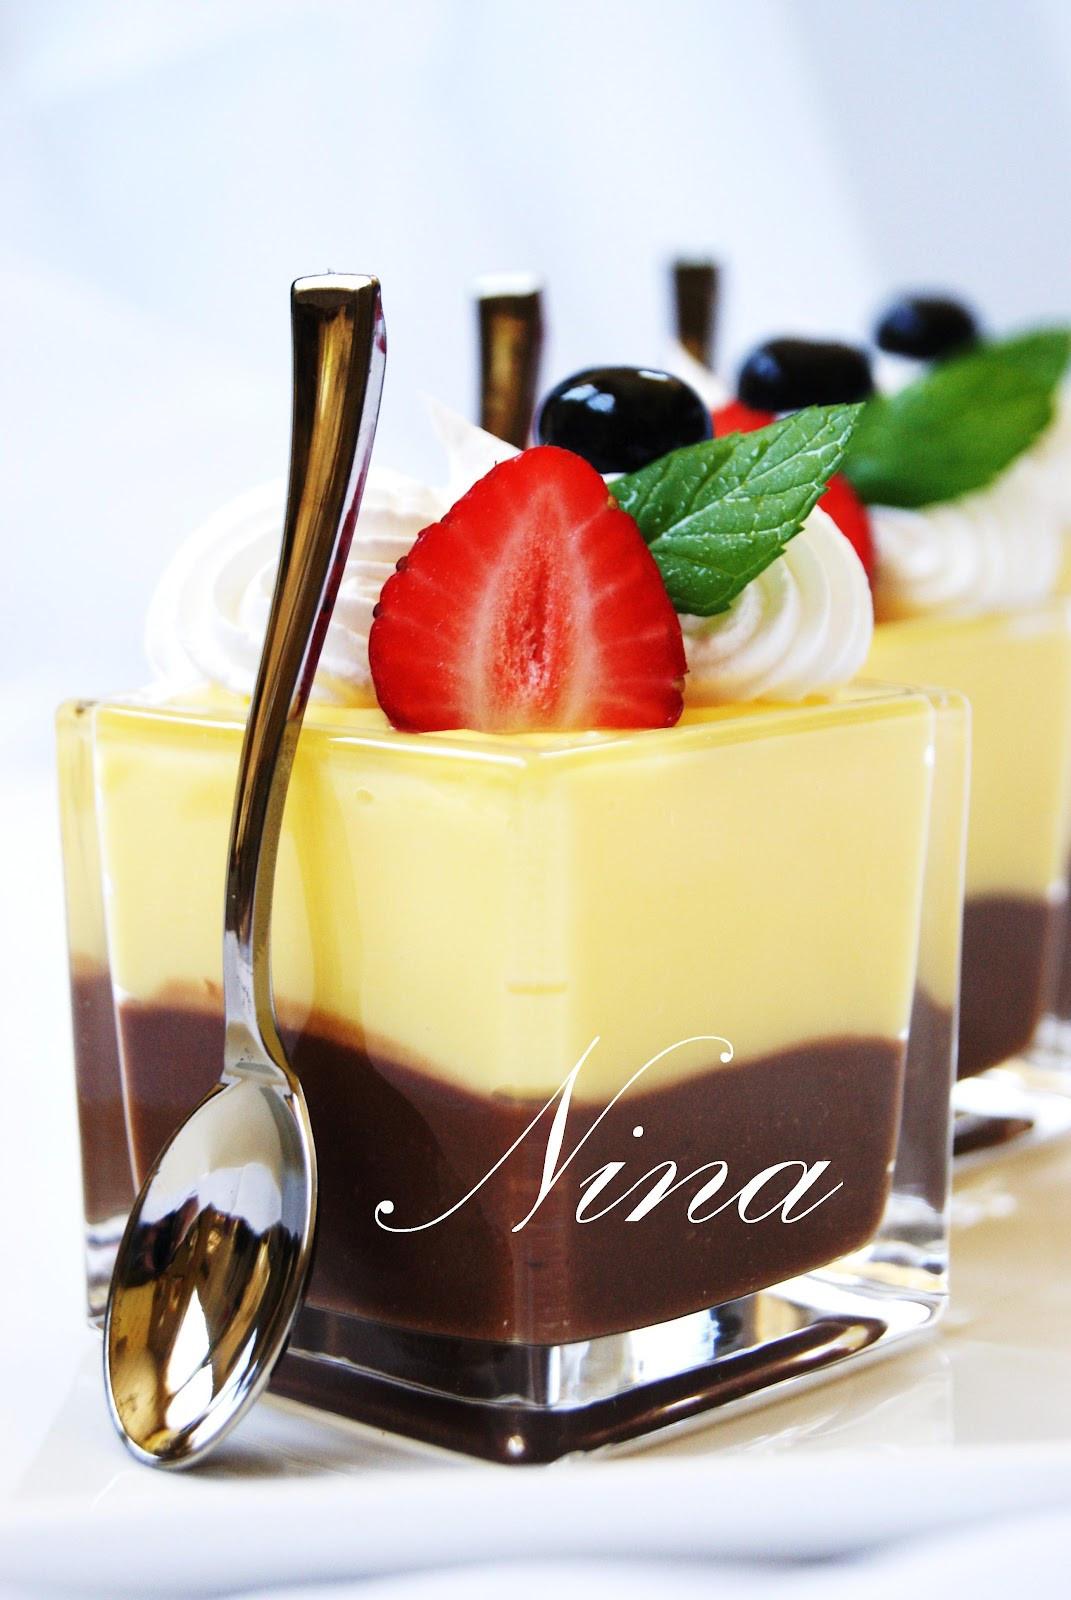 Vanilla Pudding Desserts  NINA S RECIPES CHOCOLATE AND VANILLA PUDDING DESSERT